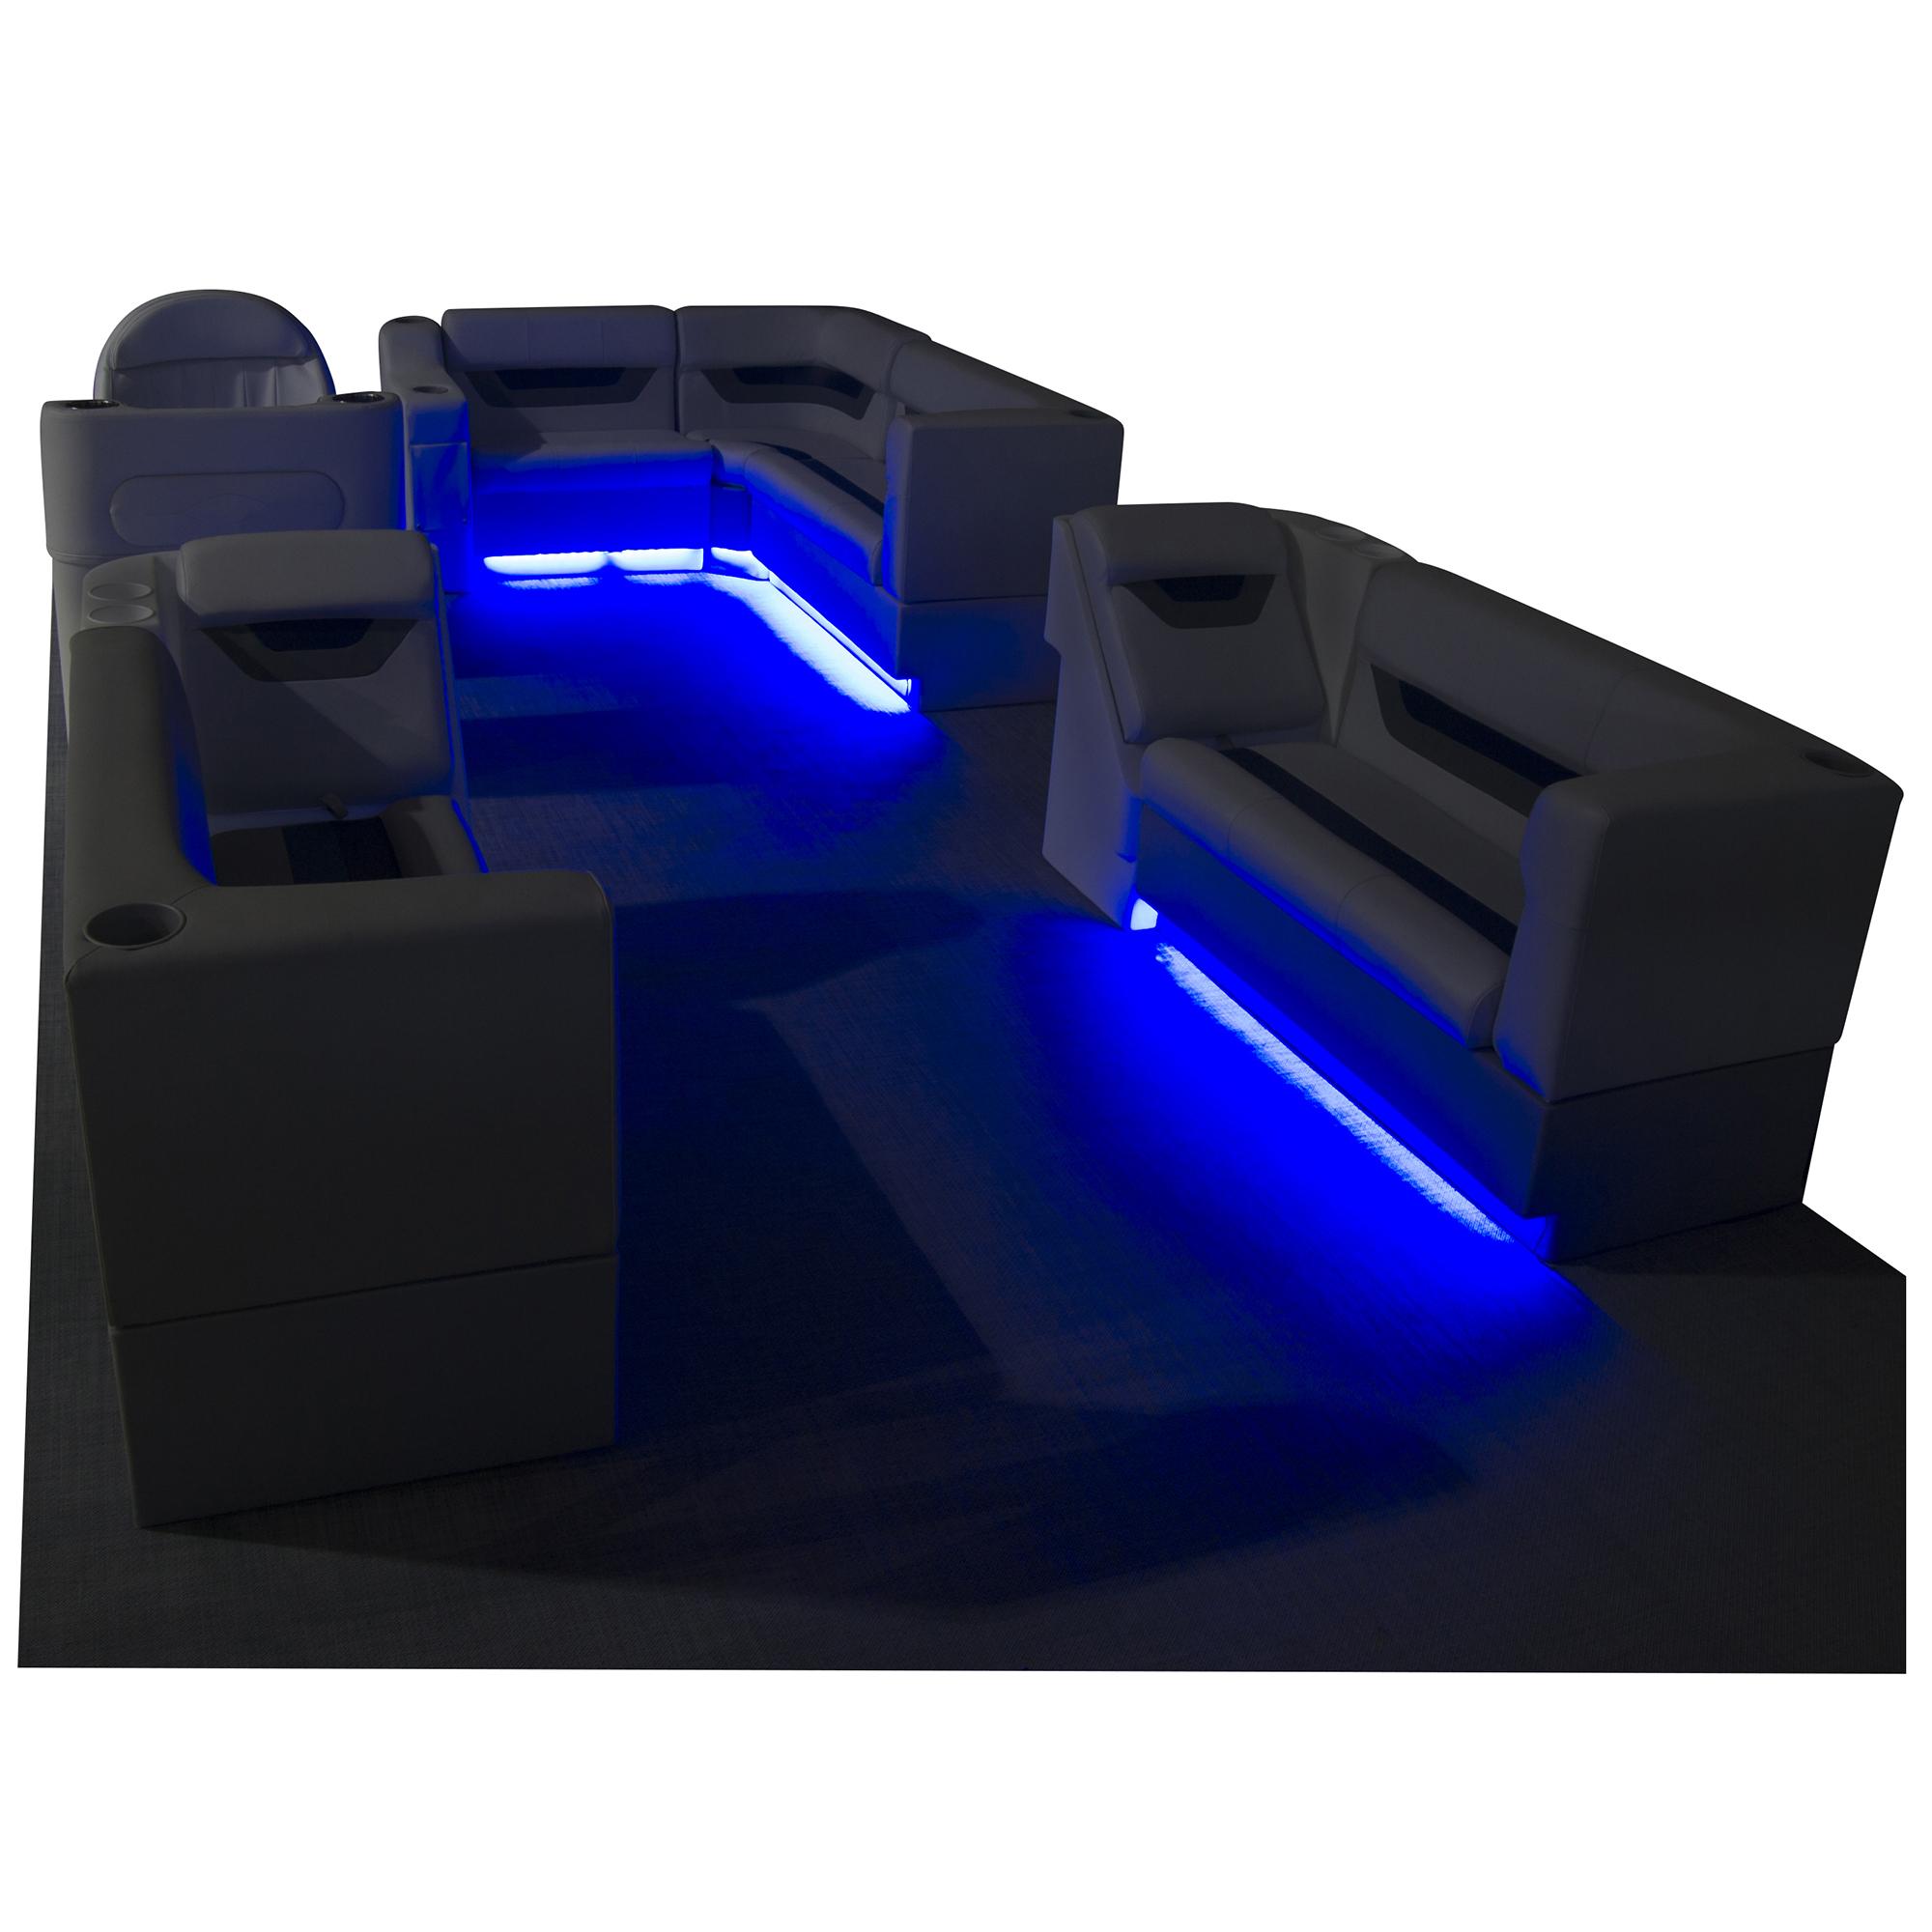 "Toonmate Designer Pontoon Furniture 63"" Front Seat Package"